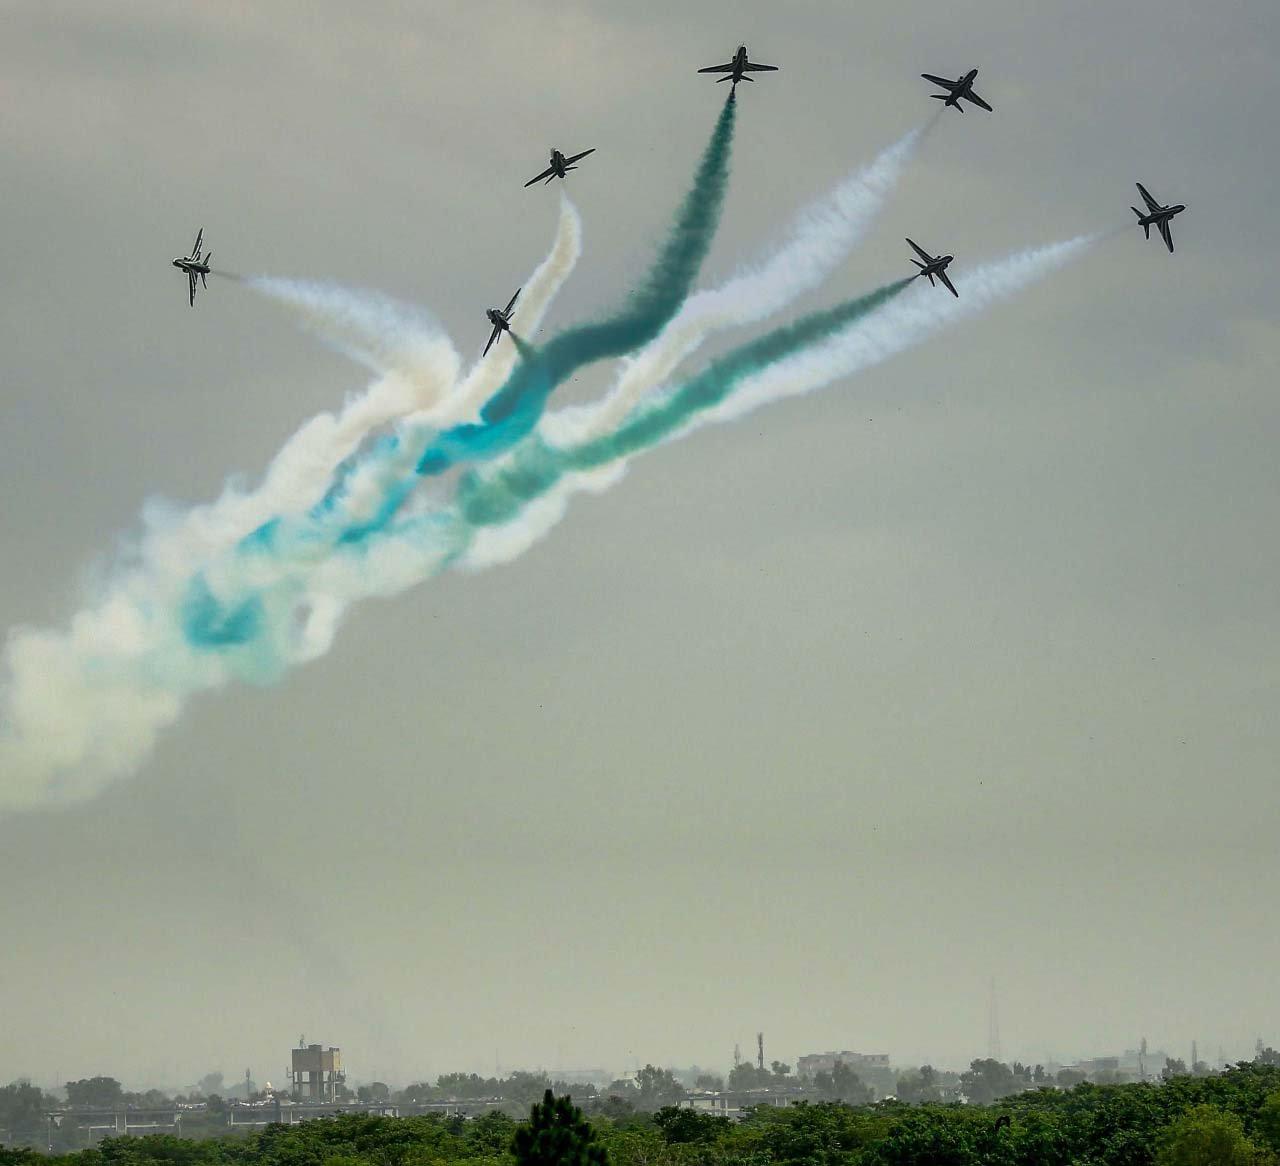 Fatima Jinnah Park Islamabad: PAF's Mega Air Show Underway In Islamabad